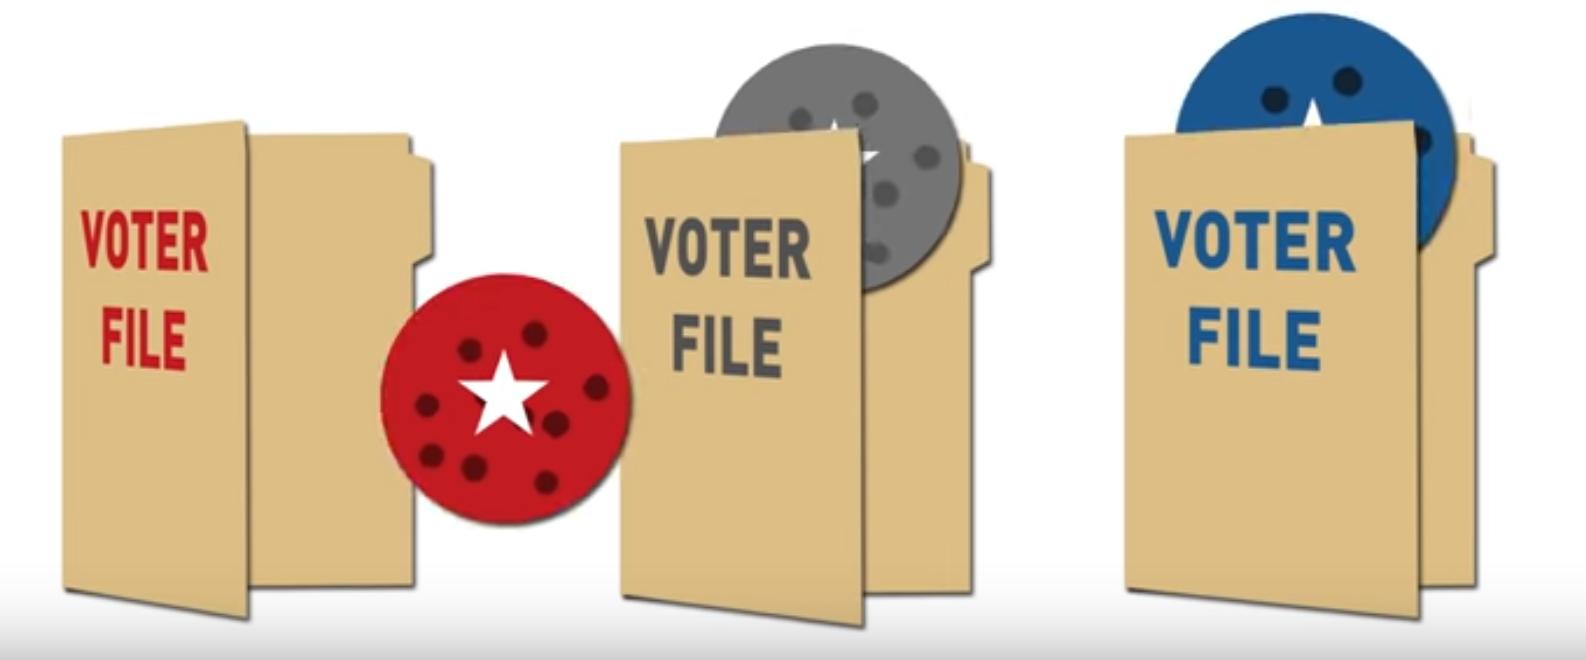 5_19-us-state-voter-list